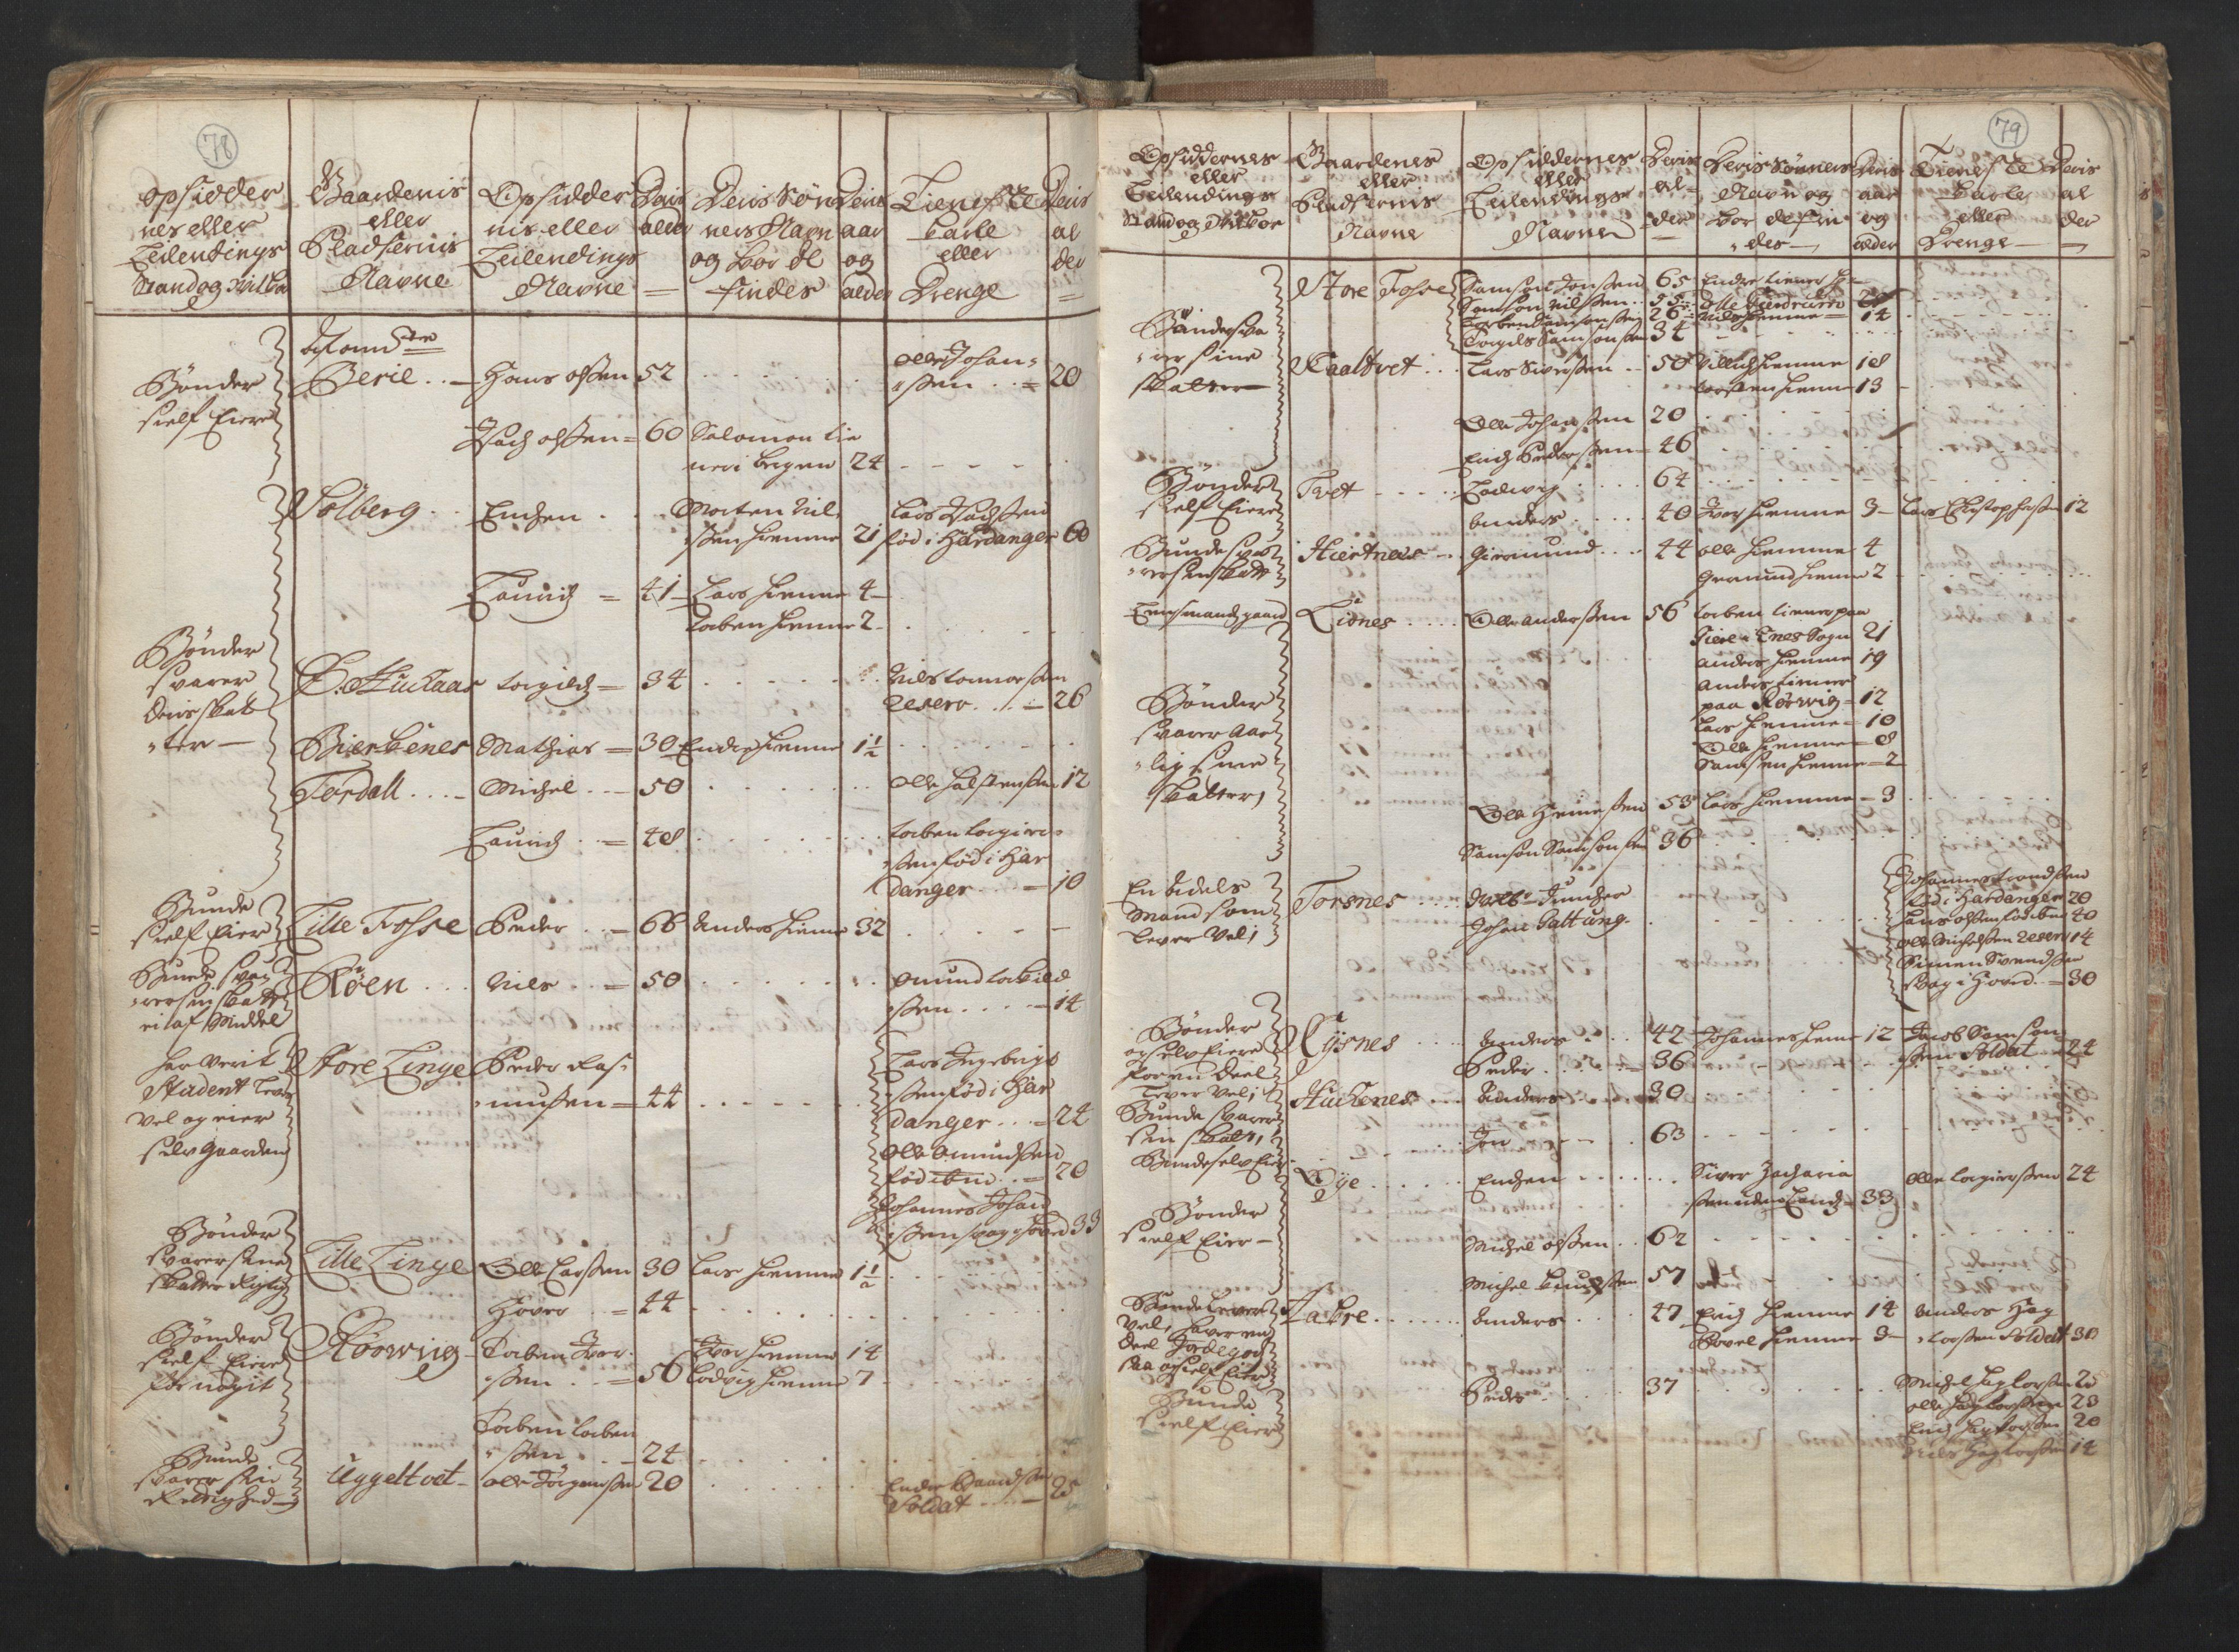 RA, Manntallet 1701, nr. 6: Sunnhordland fogderi og Hardanger fogderi, 1701, s. 78-79